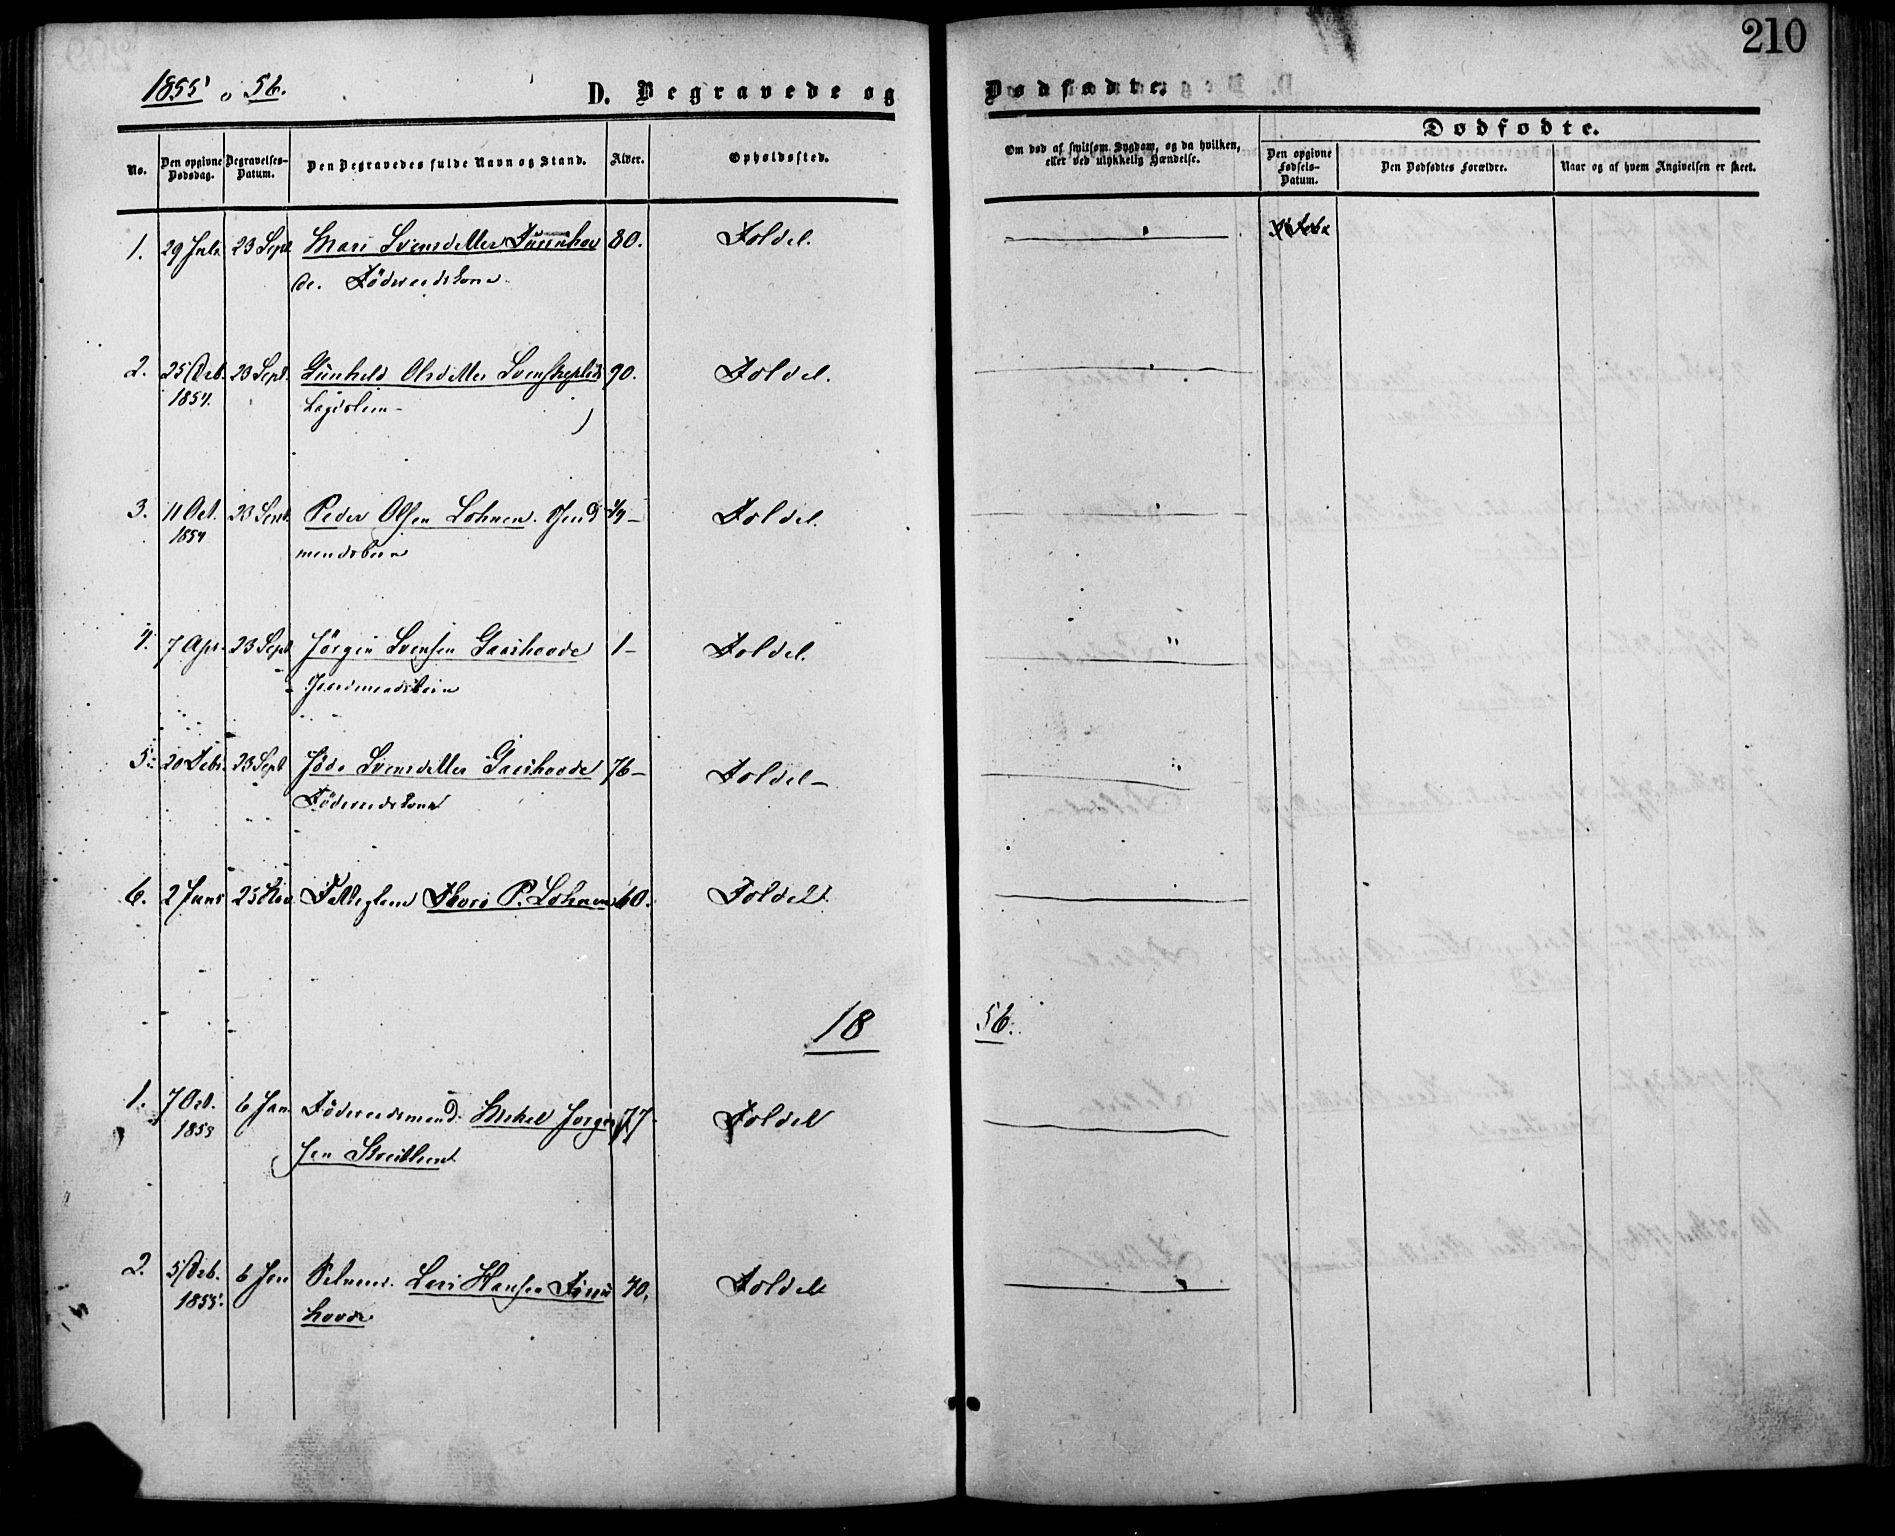 SAH, Lesja prestekontor, Ministerialbok nr. 7, 1854-1862, s. 210